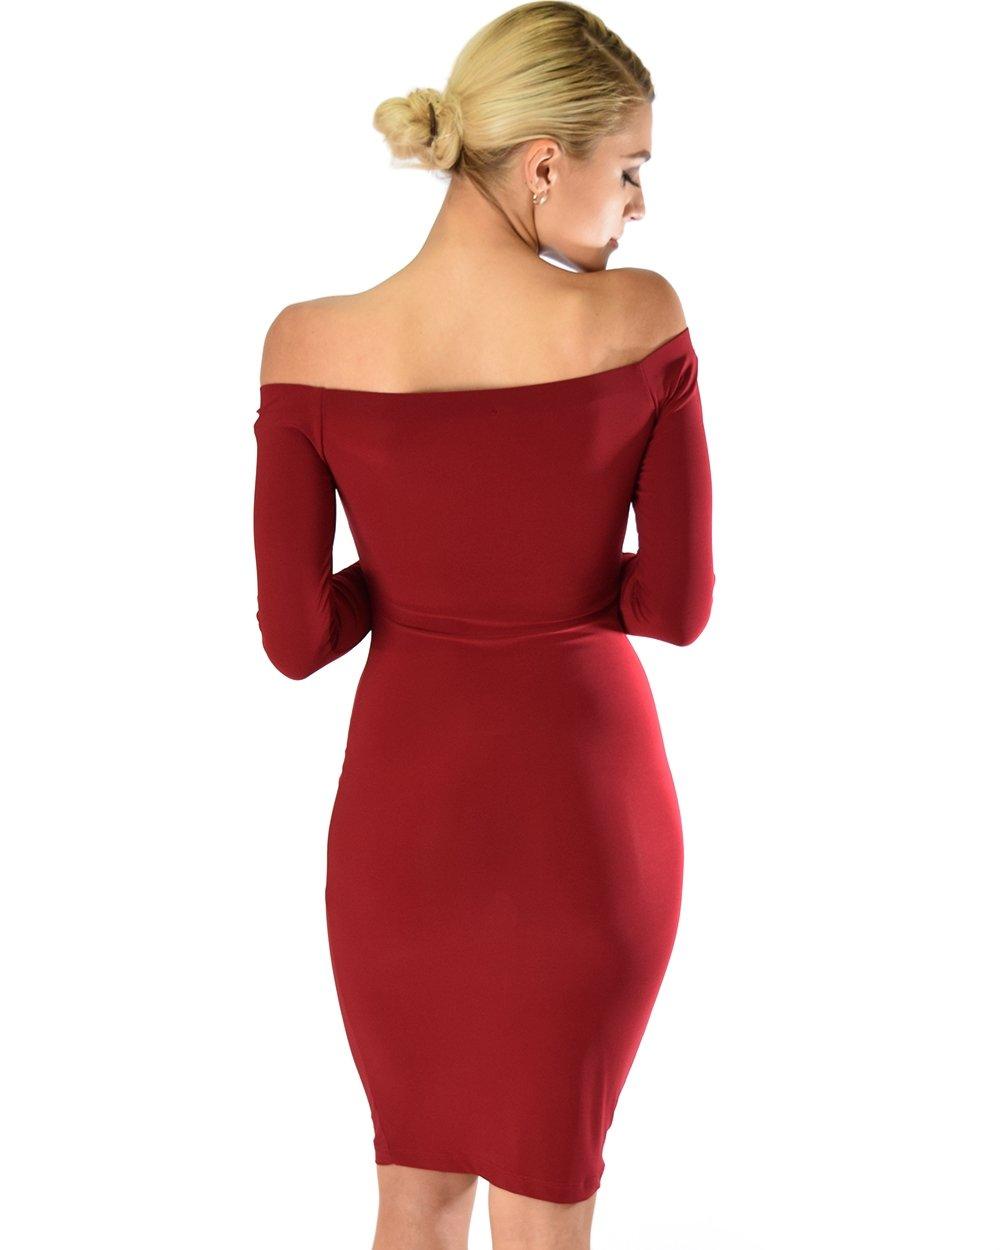 Image of Burgundy Long Sleeve Bodycon Dress